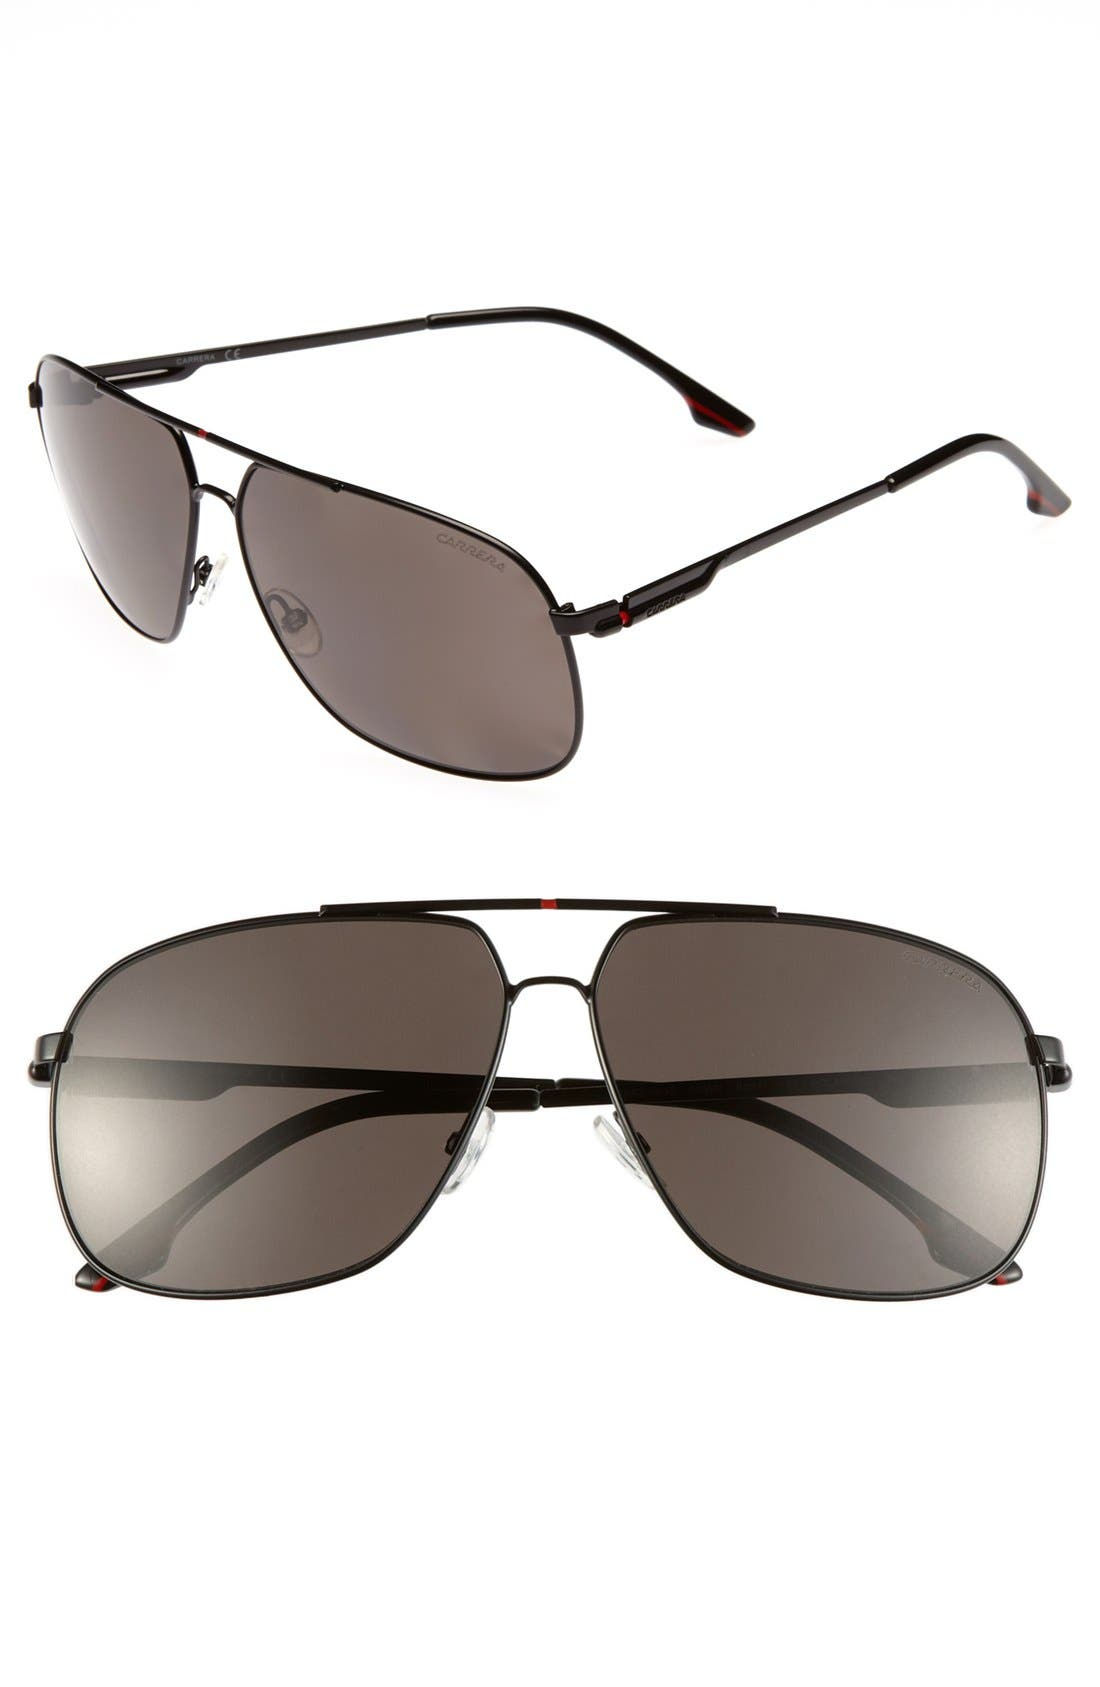 Main Image - Carrera Eyewear 59mm Sunglasses